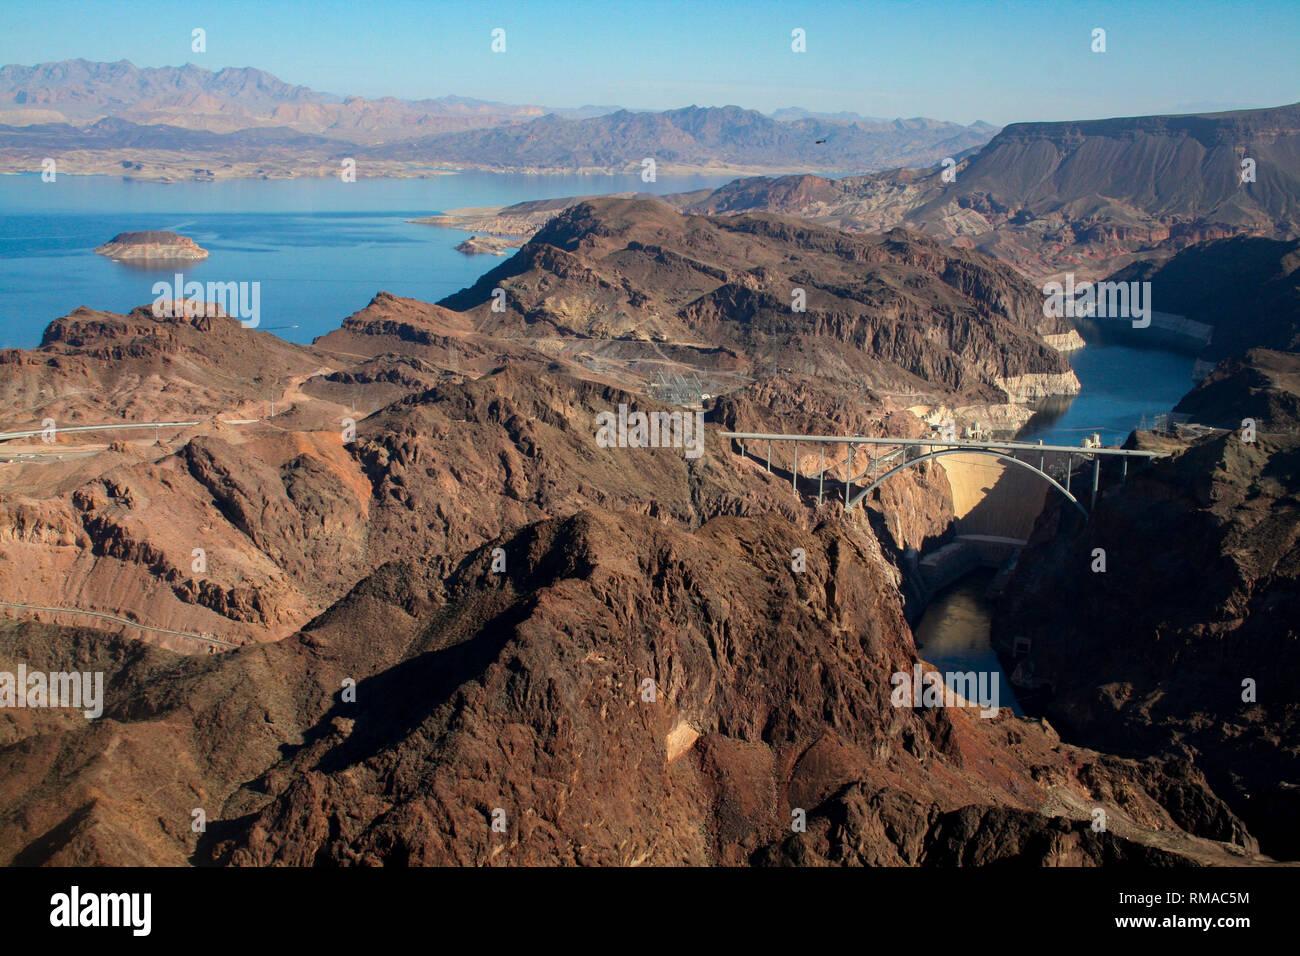 Hoover Dam in Nevada, USA Stock Photo